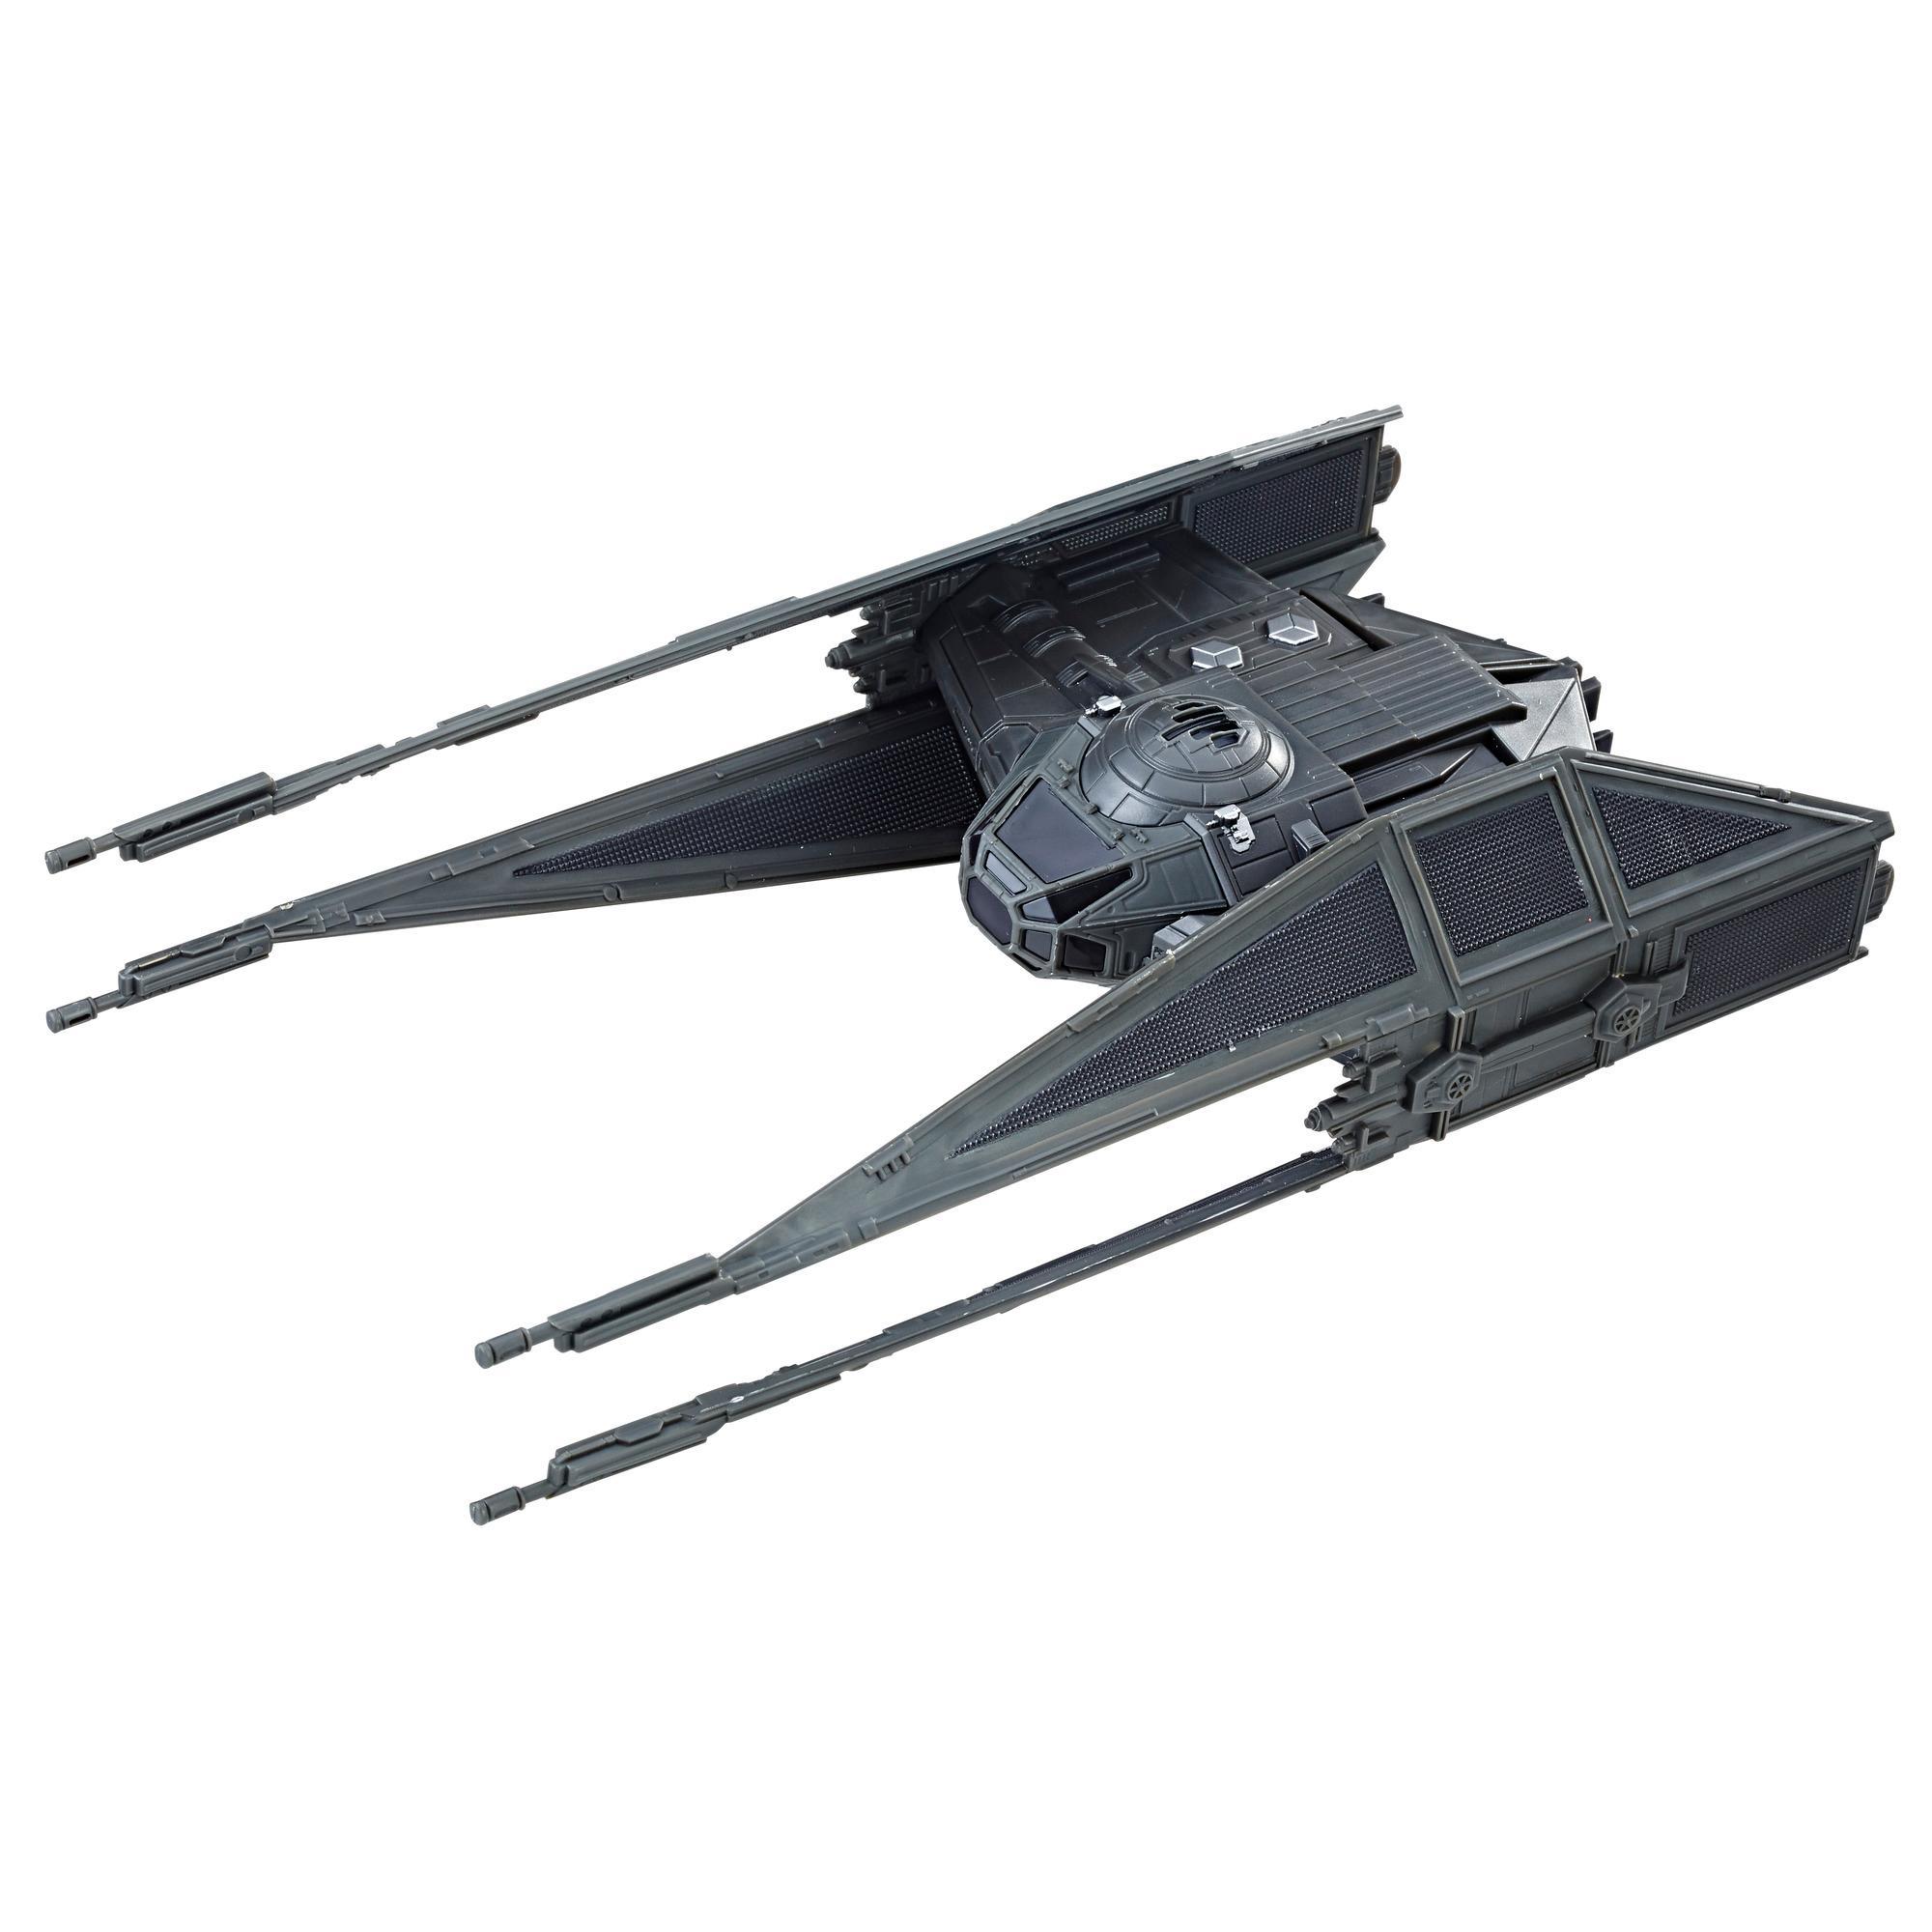 Star Wars : Les Derniers Jedi - TIE Silencer de Kylo Ren